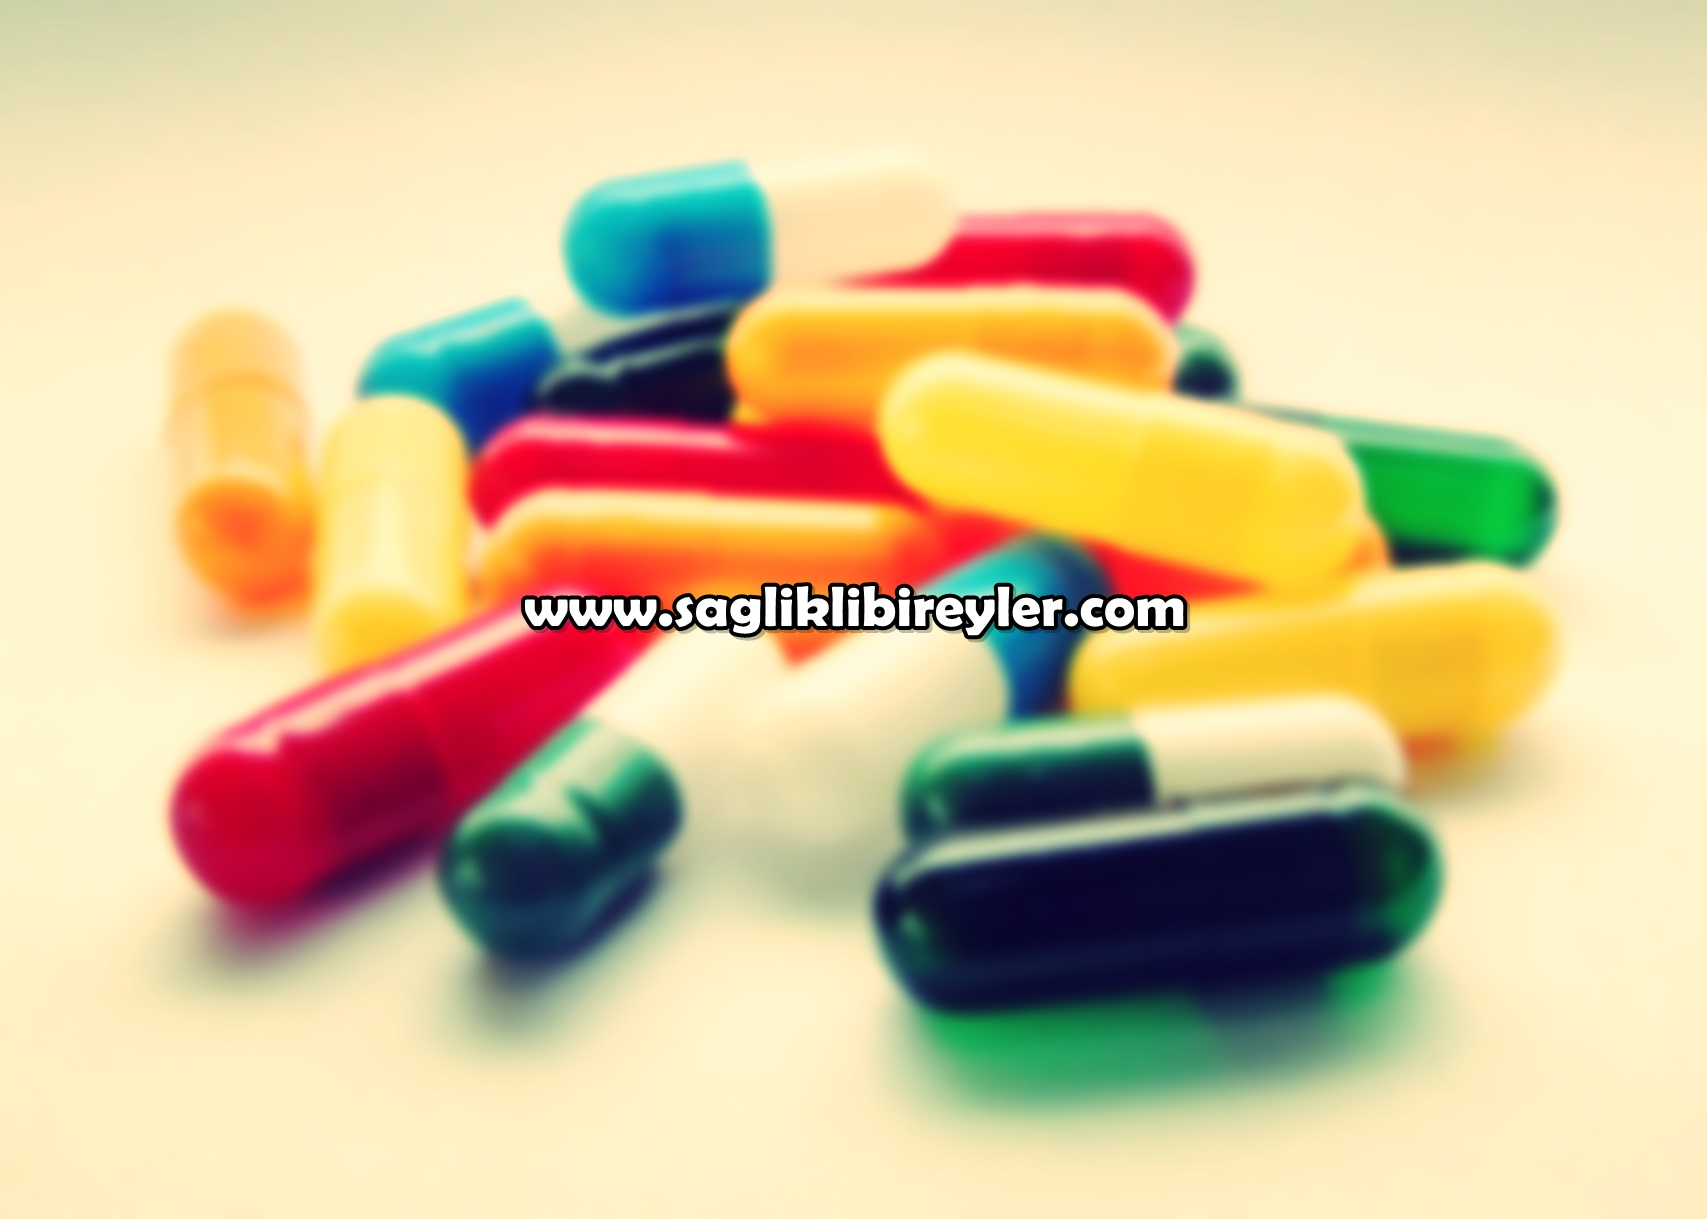 Kilo Aldirmayan Antidepresan Ilaclari Saglikli Bireyler